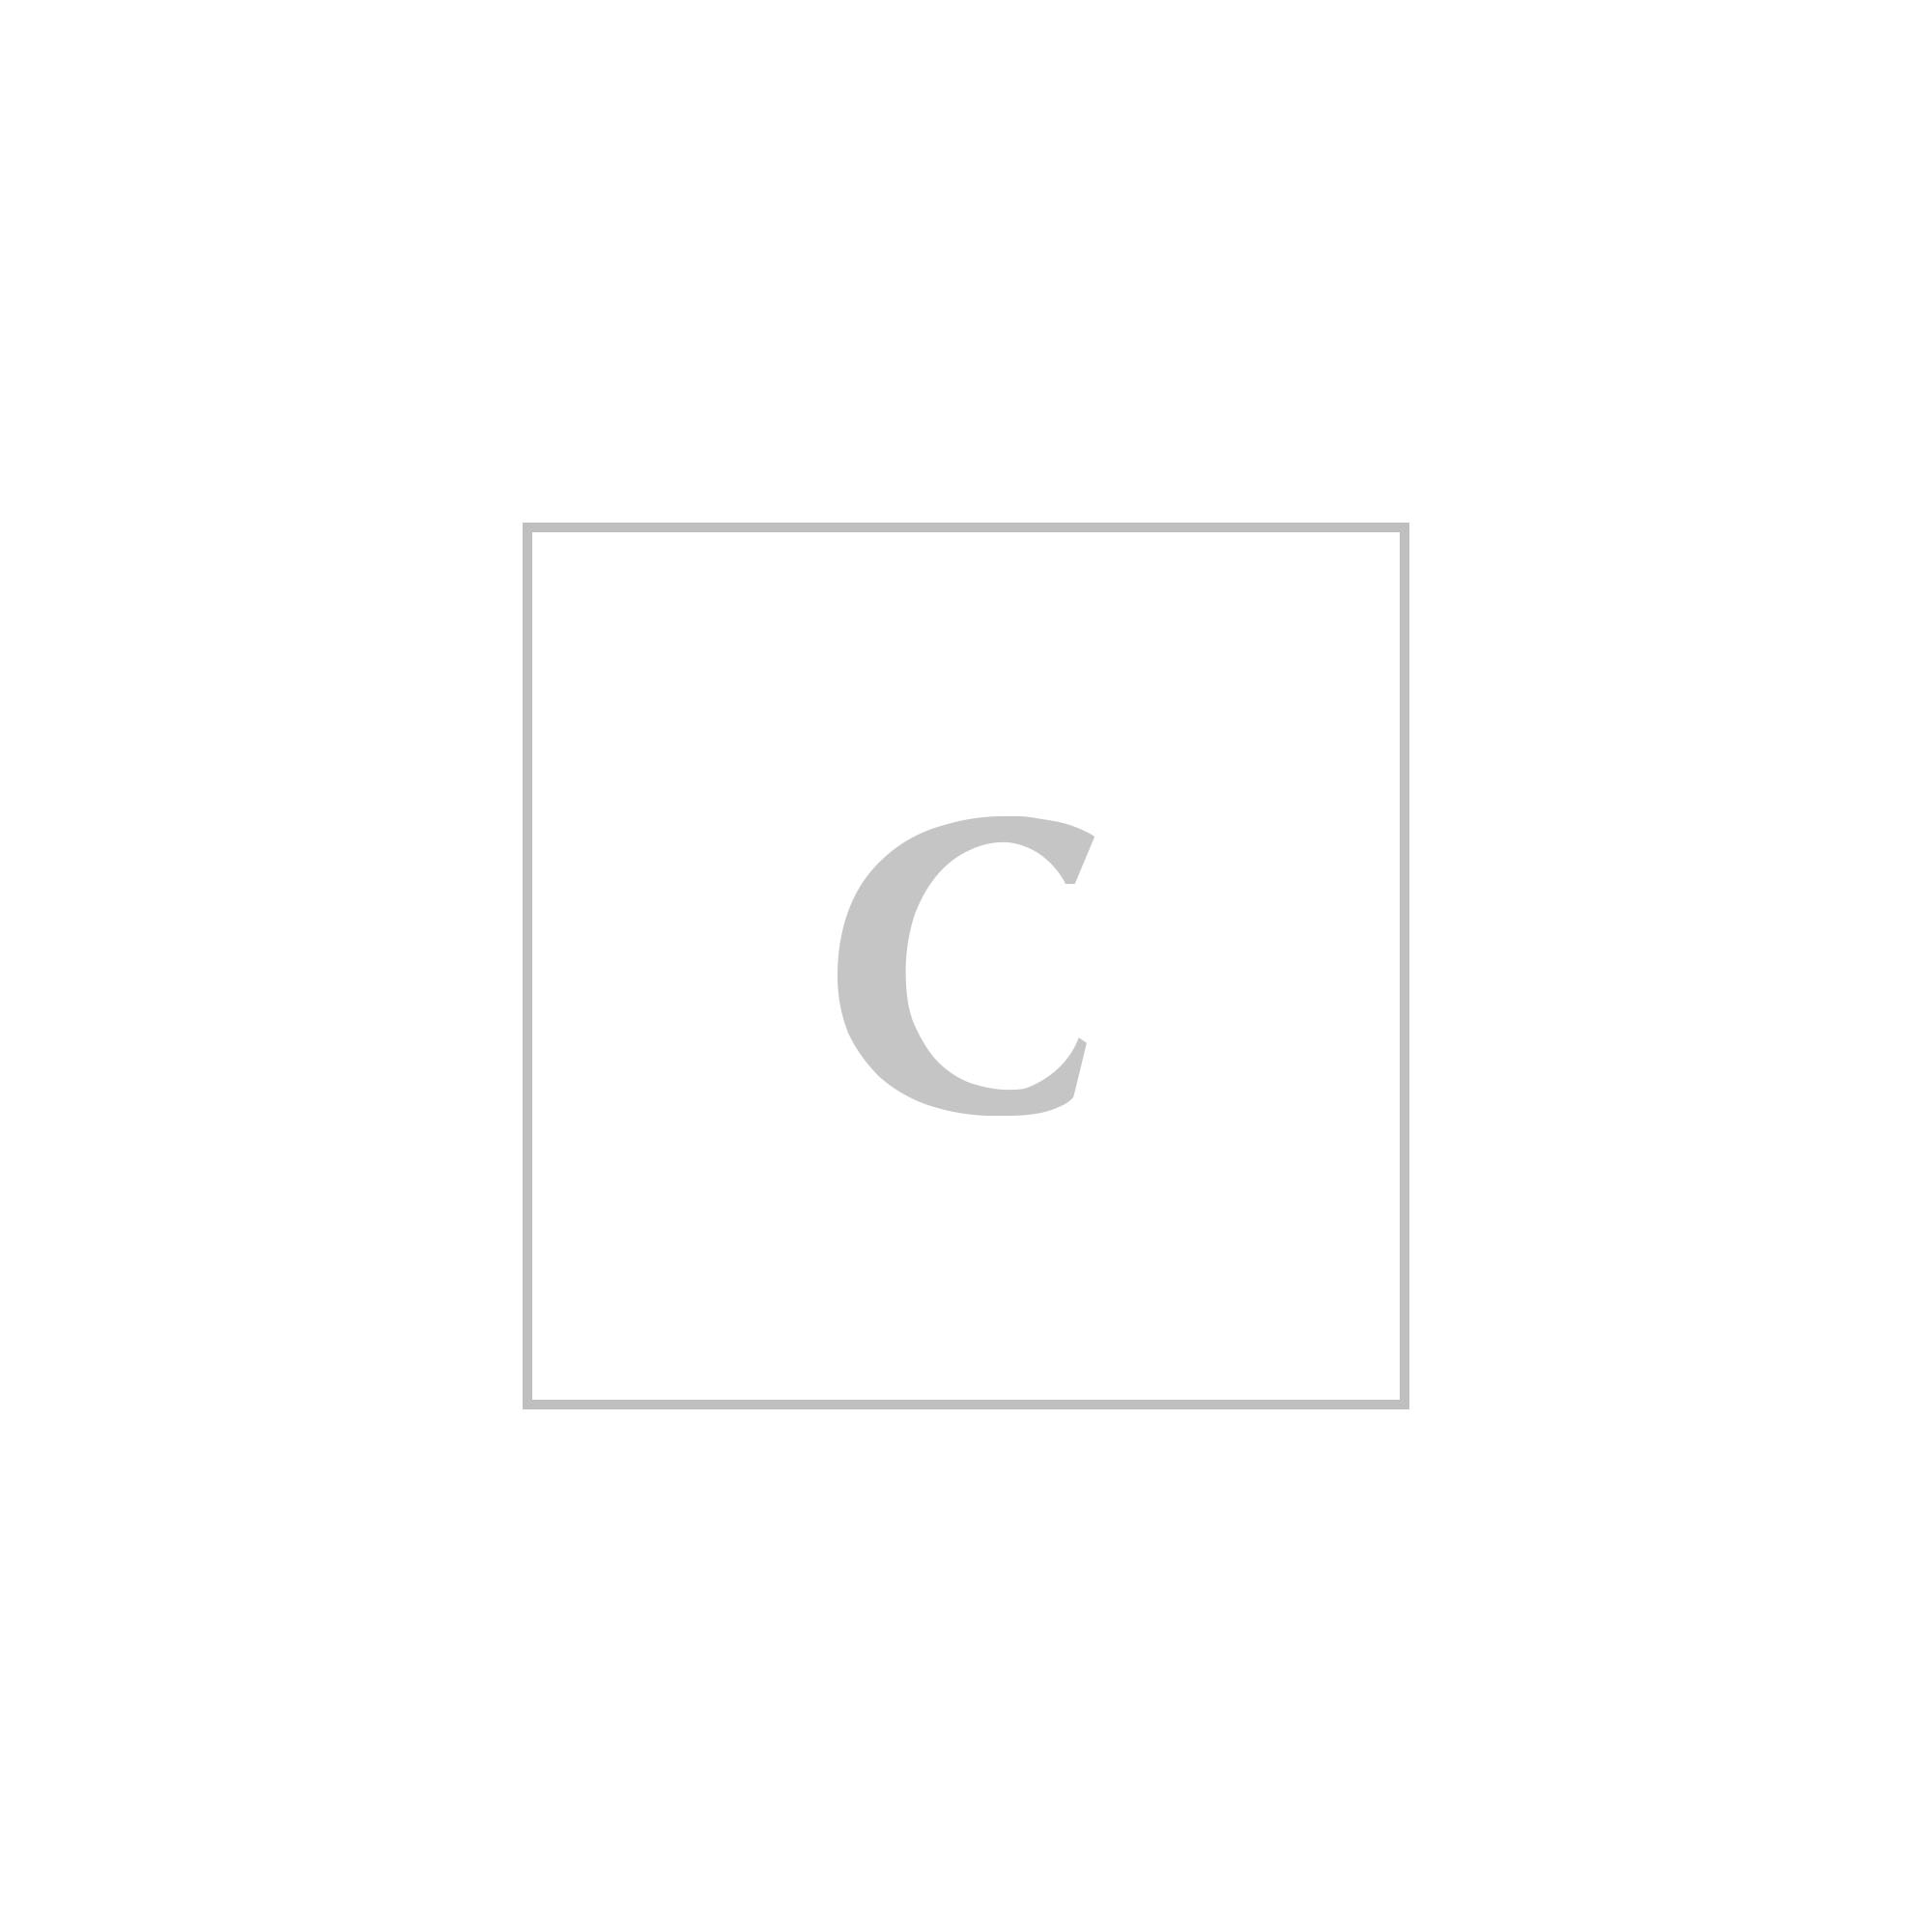 Dolce & gabbana mini bags stampa dauphine stampa